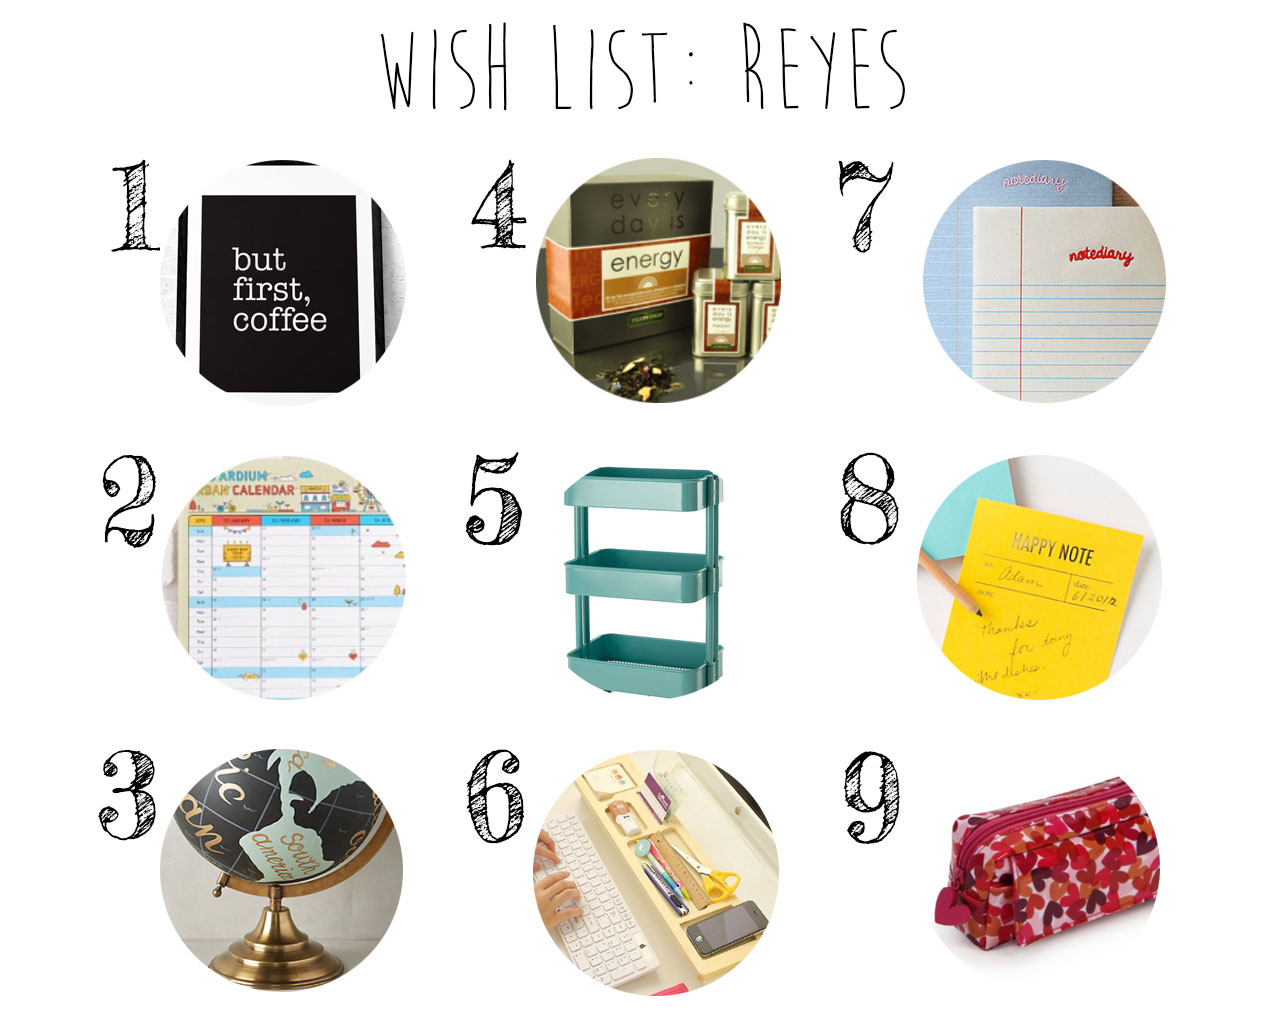 Wish List: Reyes